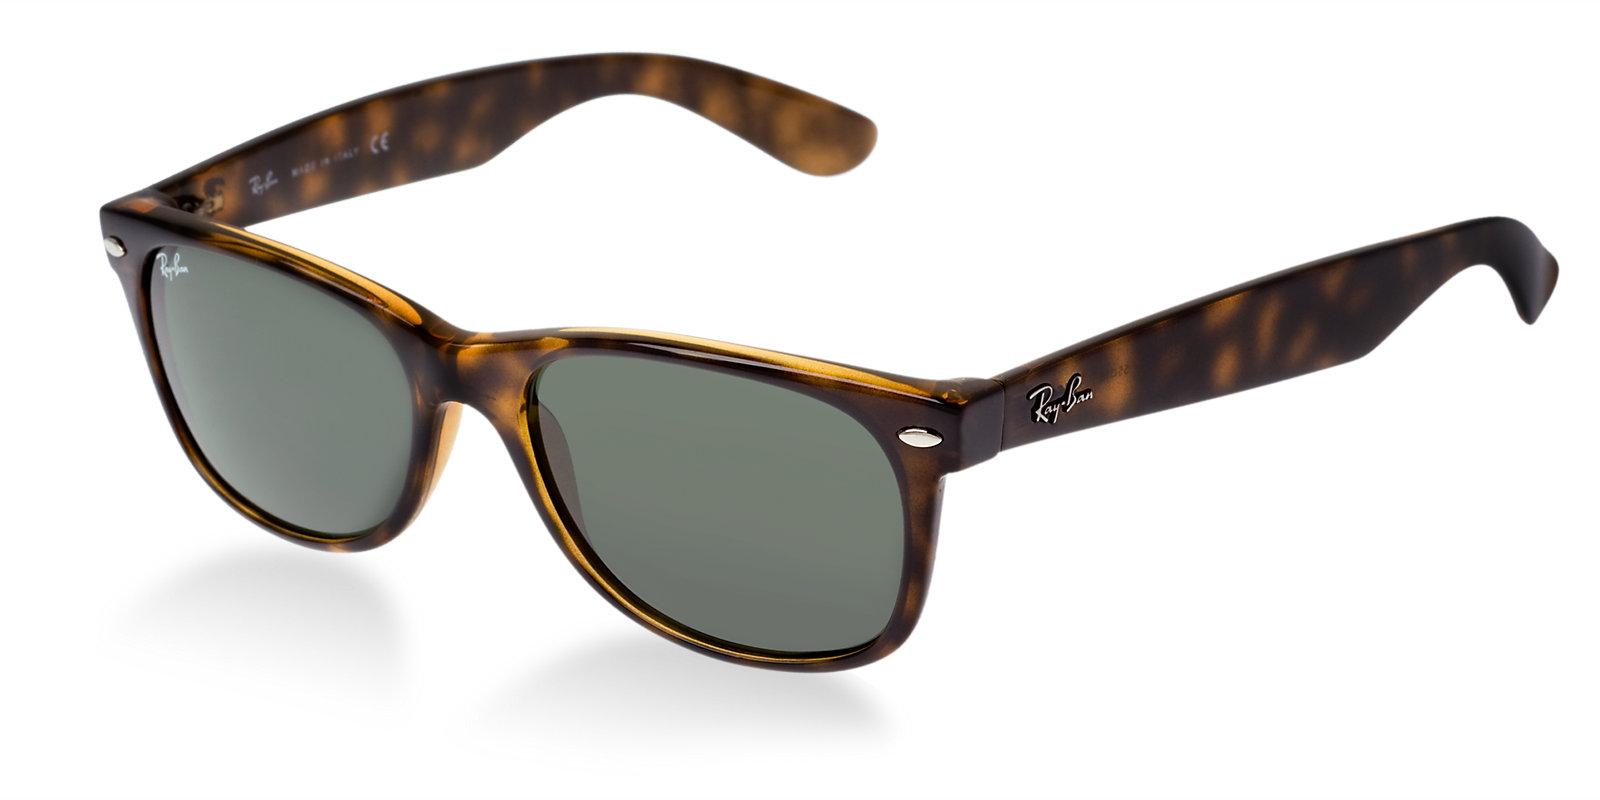 ray ban rb2132 902 tortoise new wayfarer sunglasses lux eyewear. Black Bedroom Furniture Sets. Home Design Ideas